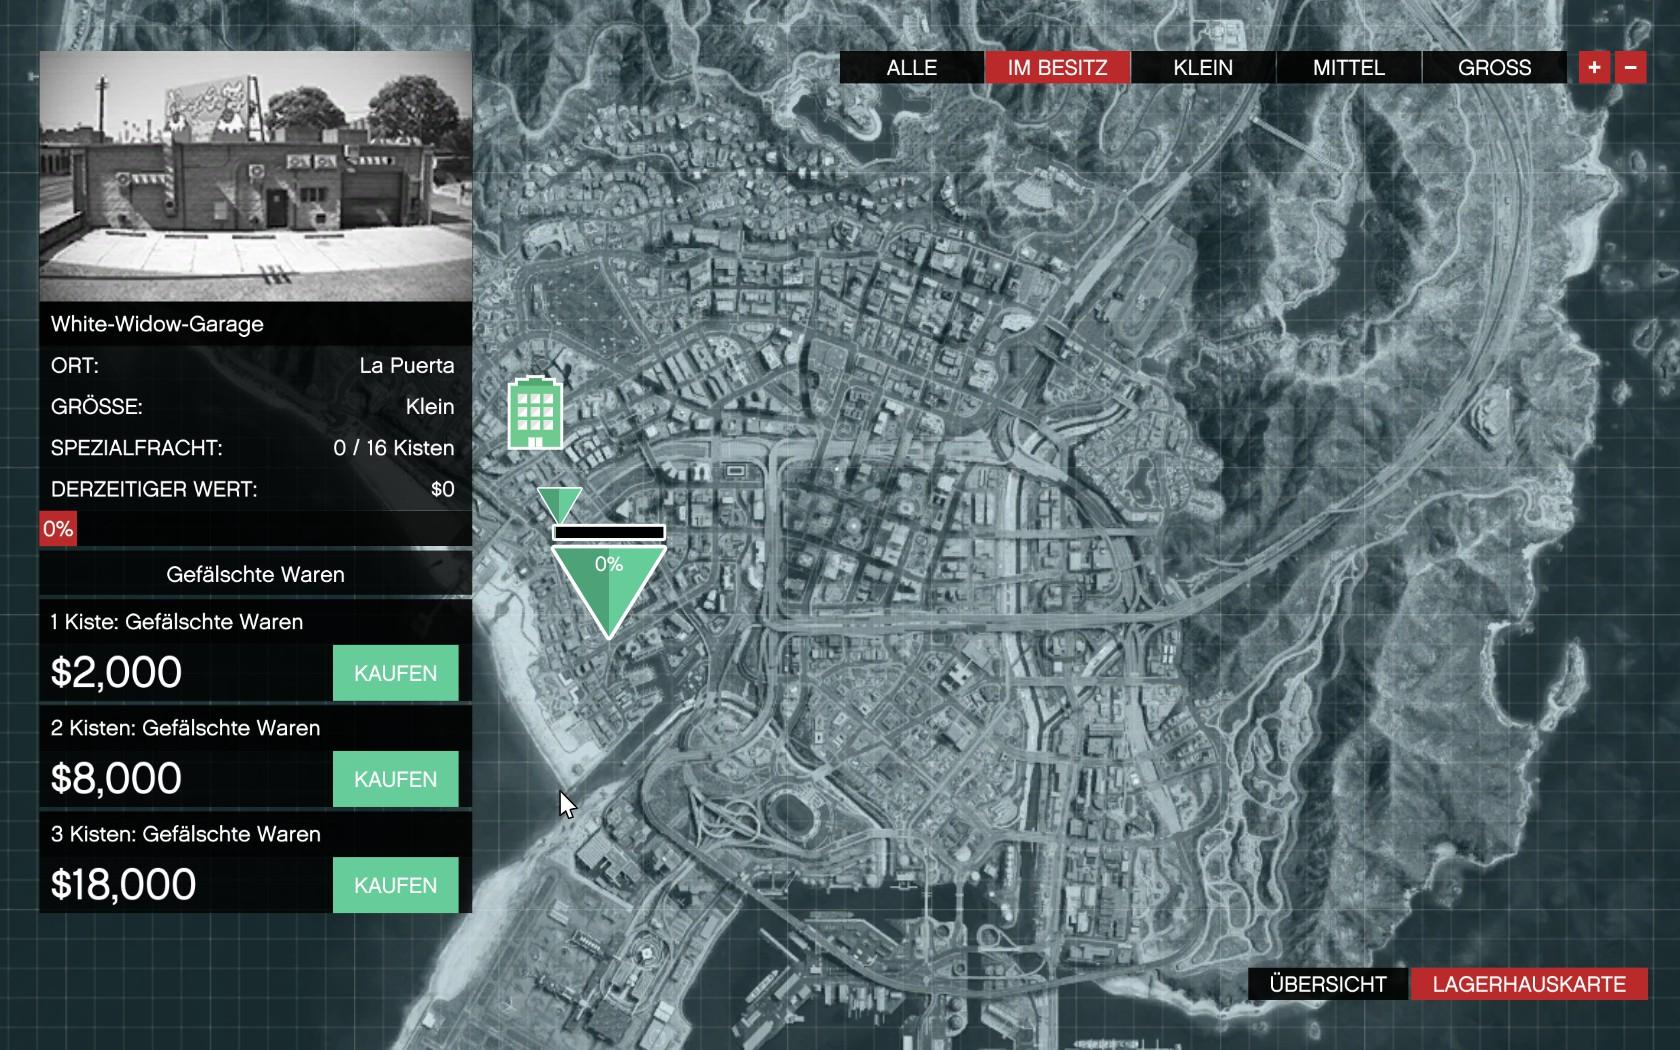 Gta 5 Karte Polizeistation.Steam Samfunn Veiledning Heist And Dlc Kompendium Online